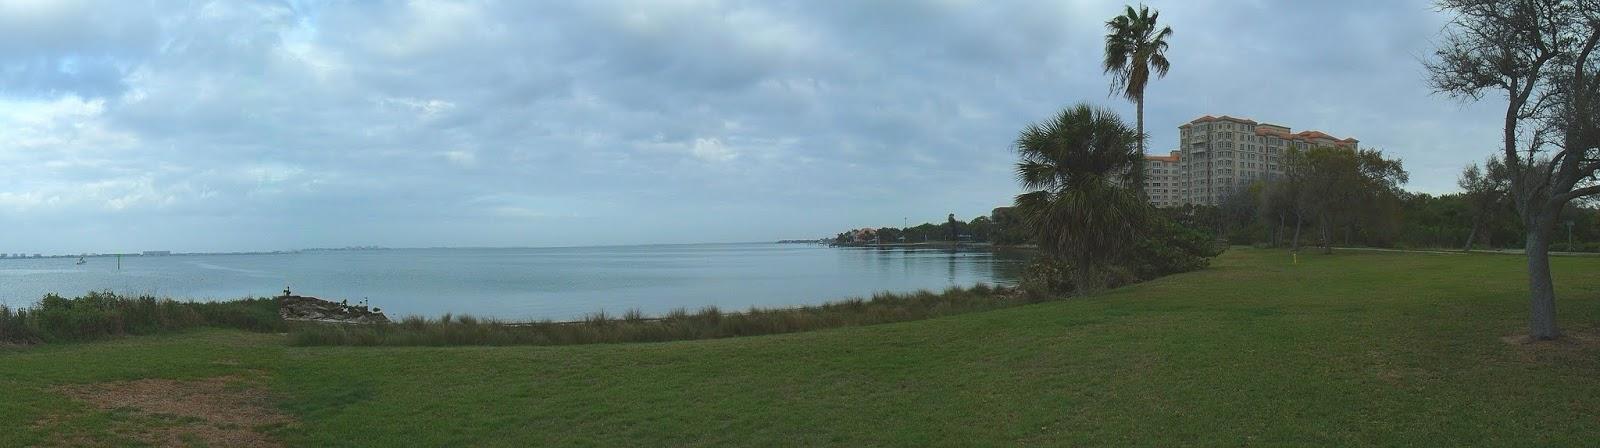 Vista de Sarasota Bay desde el Centennial Park